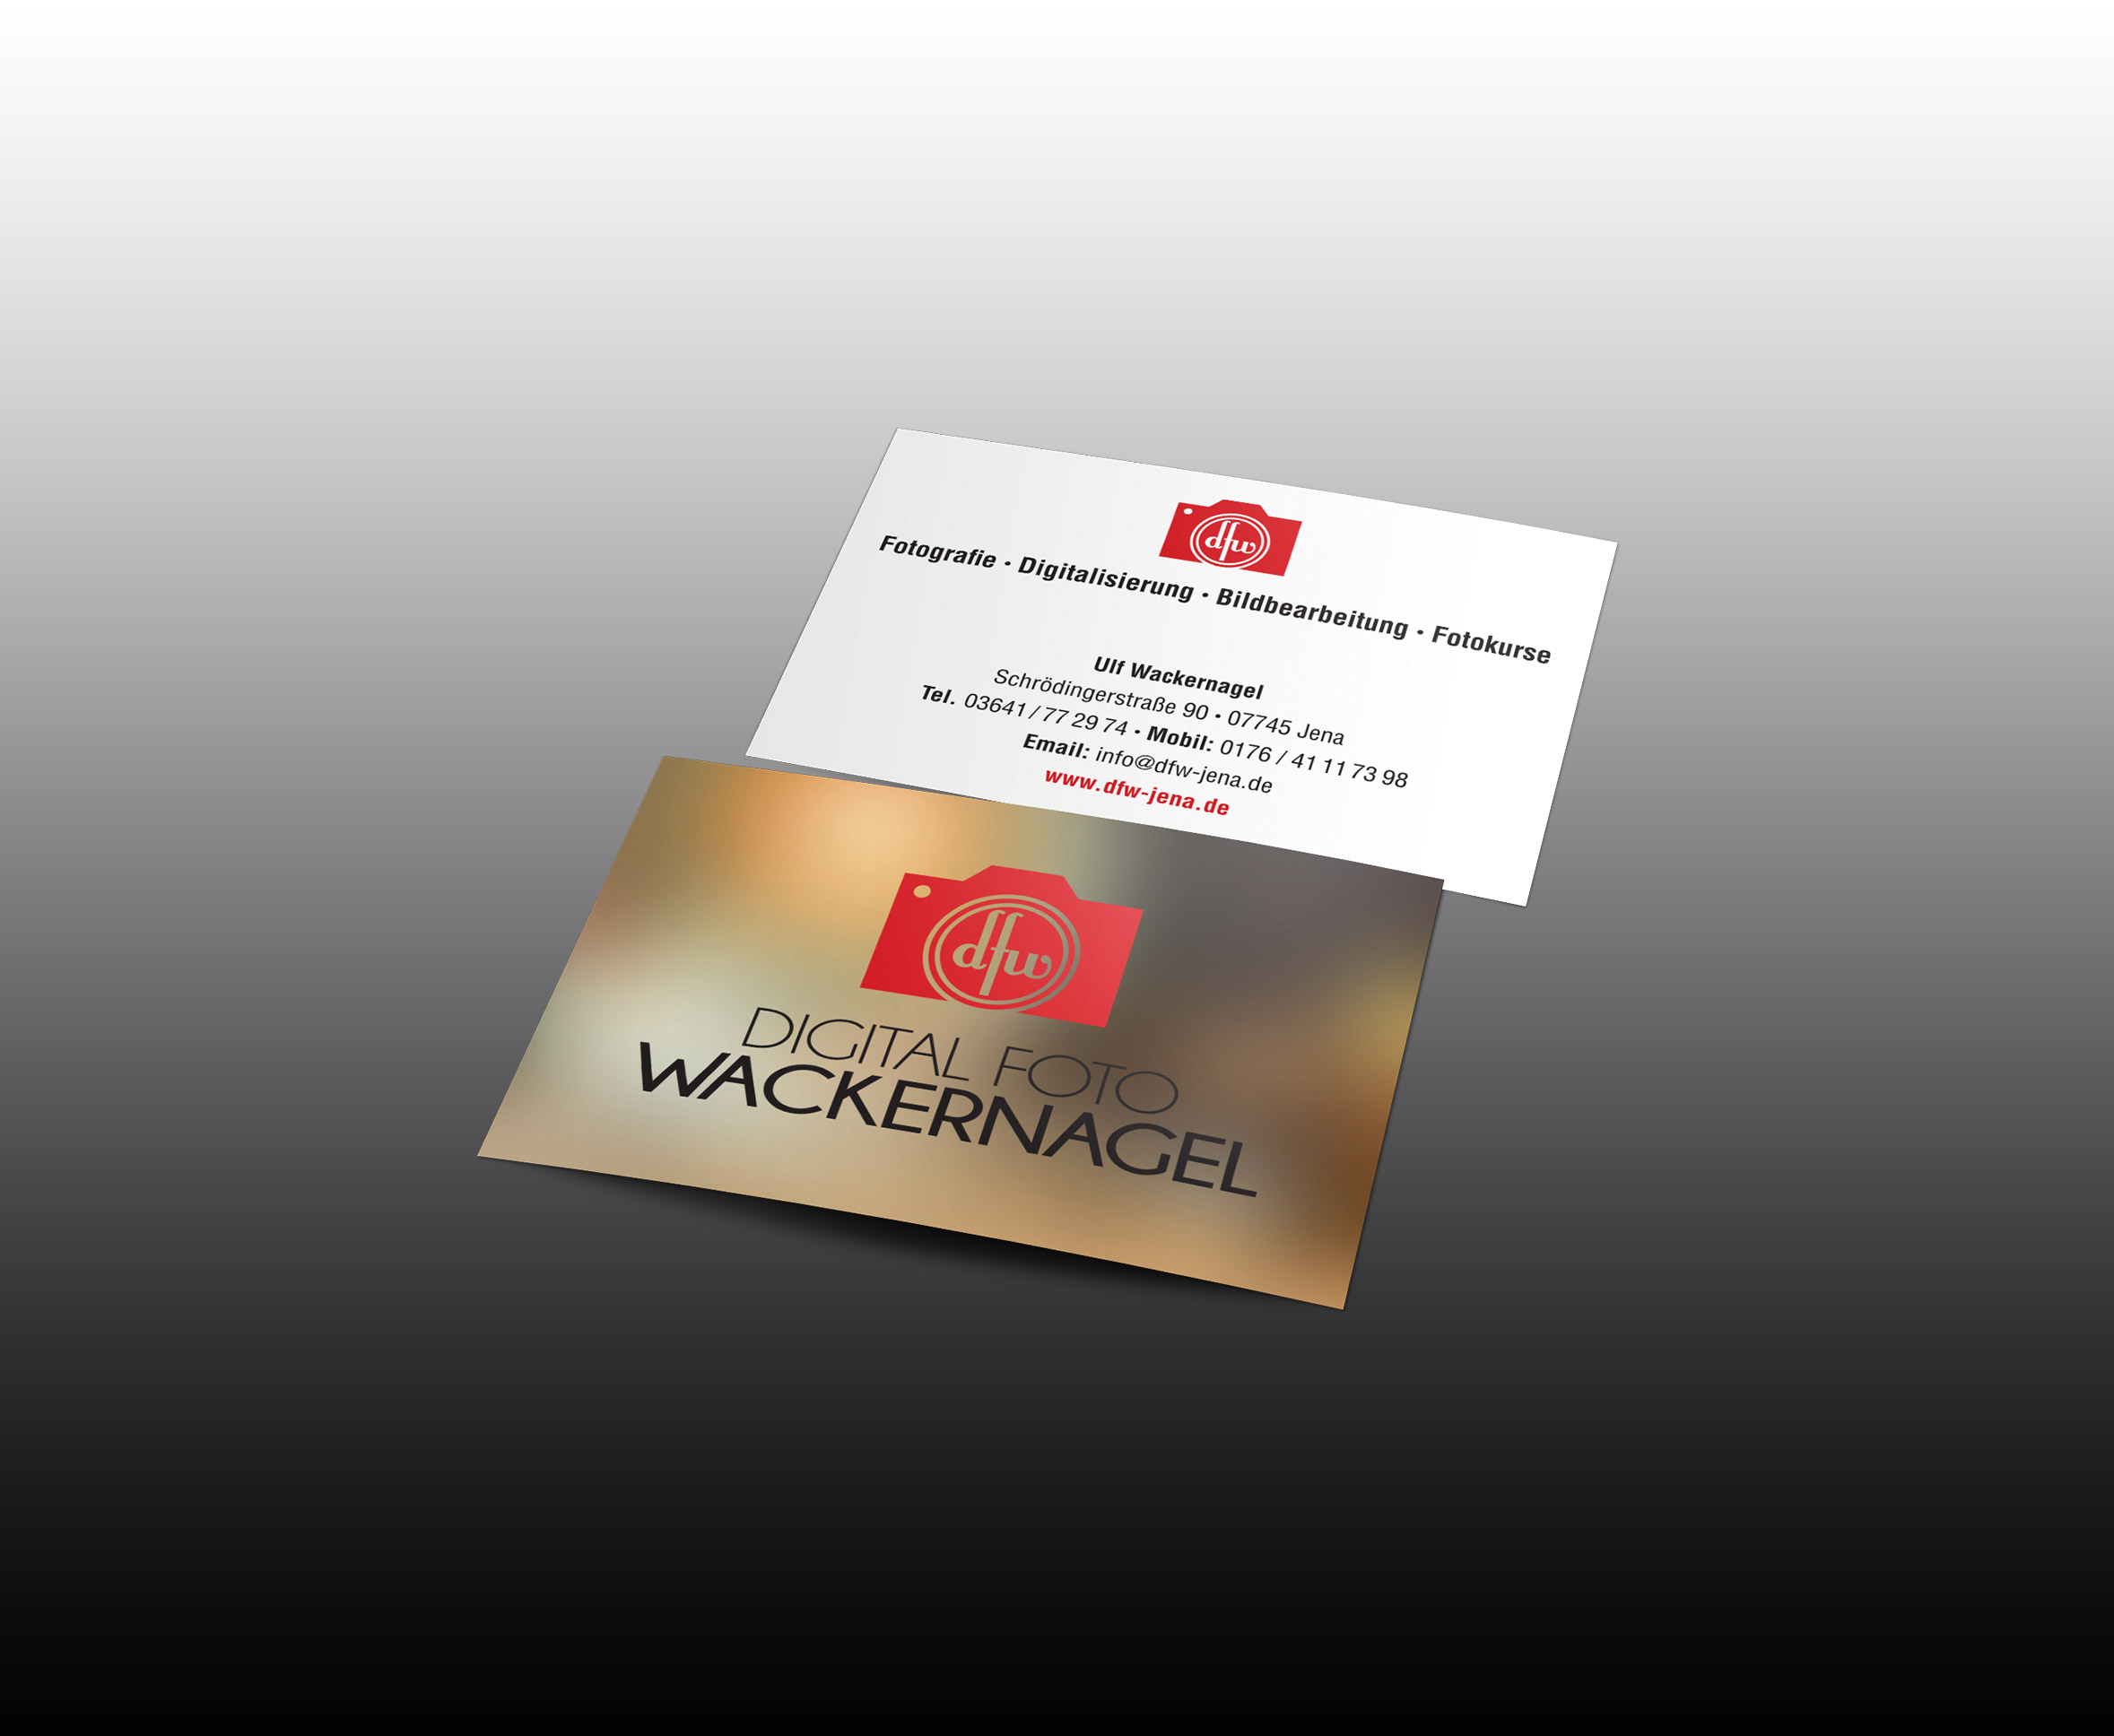 Visitenkarten Design. Logodesign Digital Foto Wackernagel